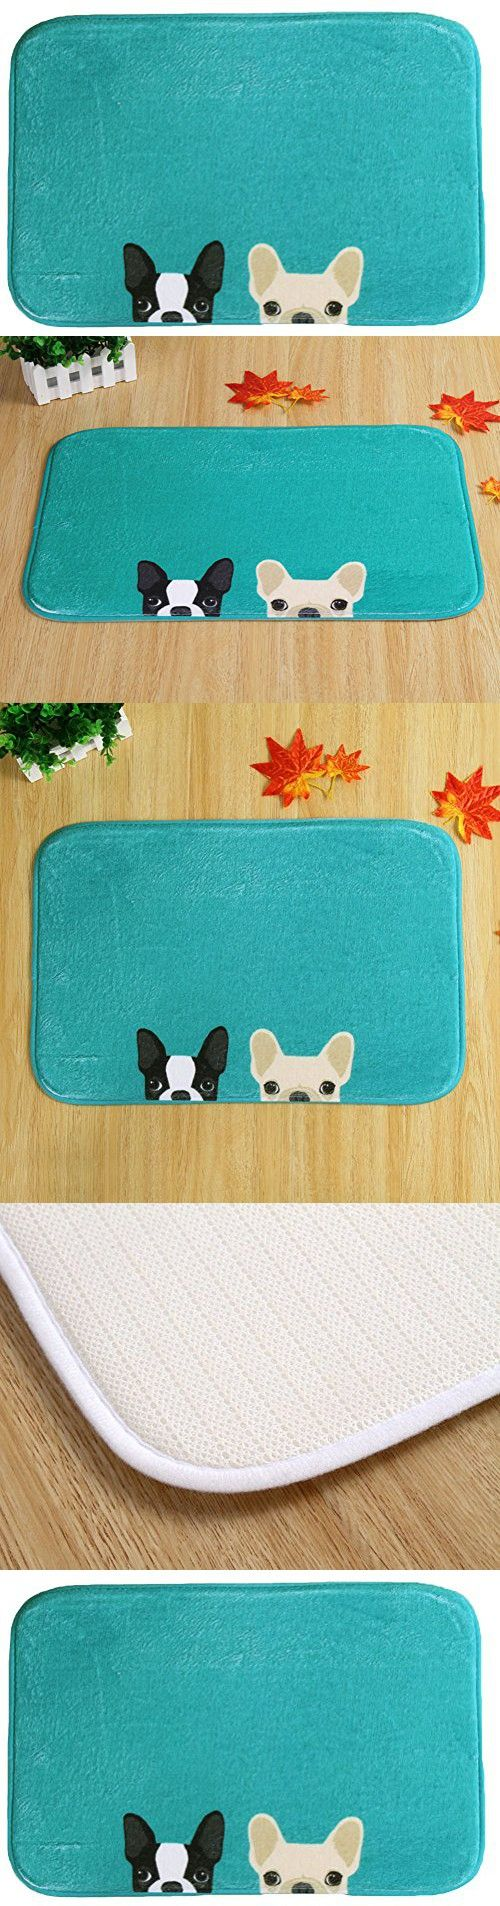 Best 25+ Washable door mats ideas on Pinterest | Water traps ...